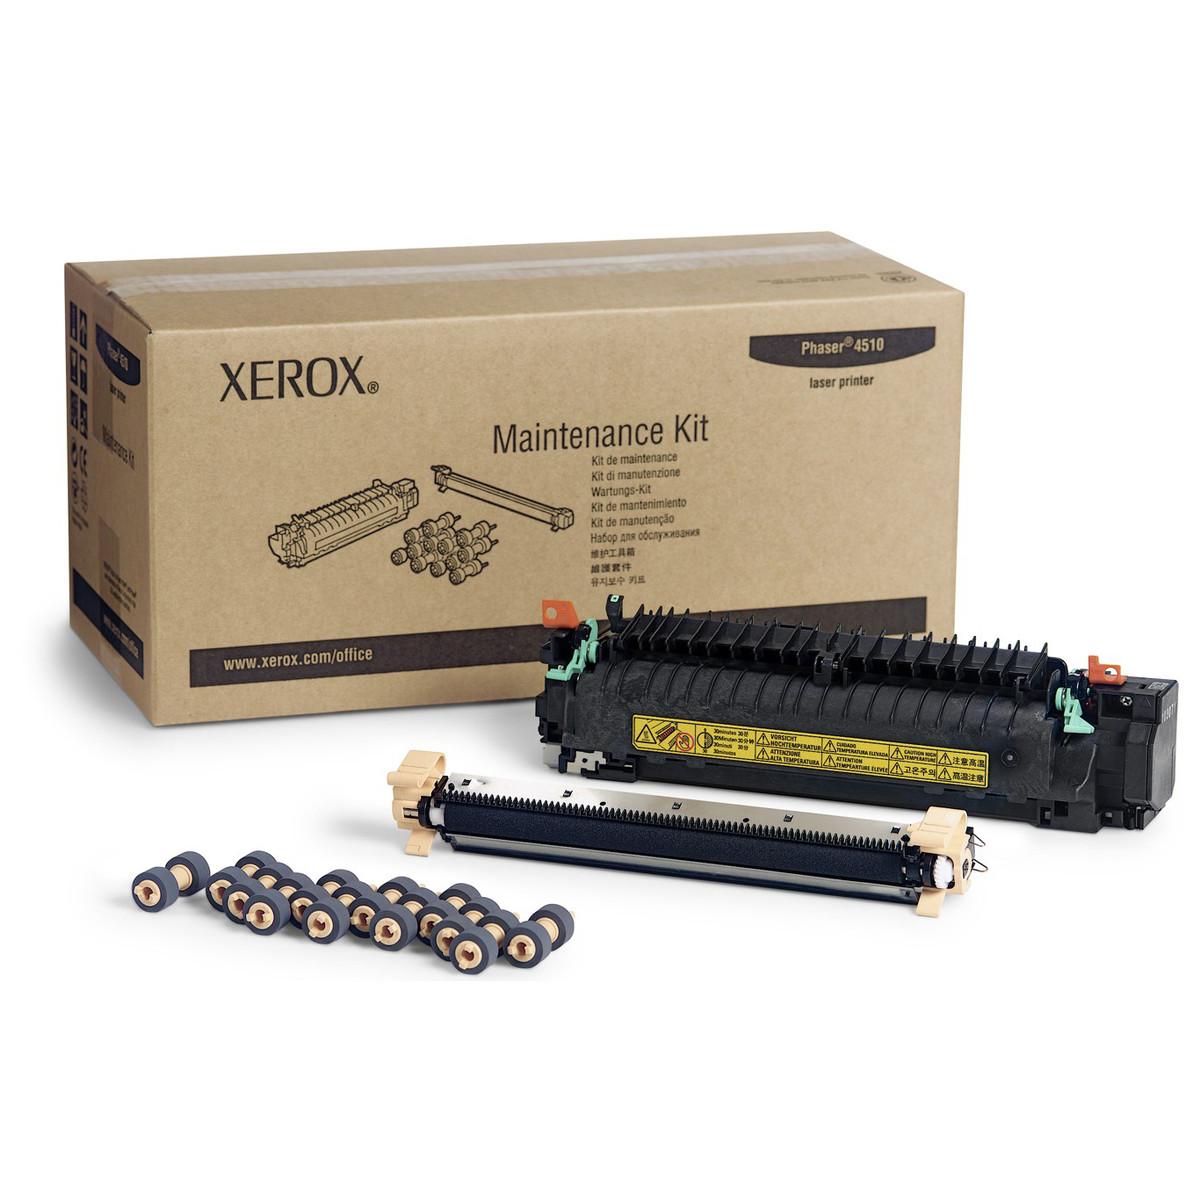 Xerox P4510 Maintenance Kit (110V/220V)